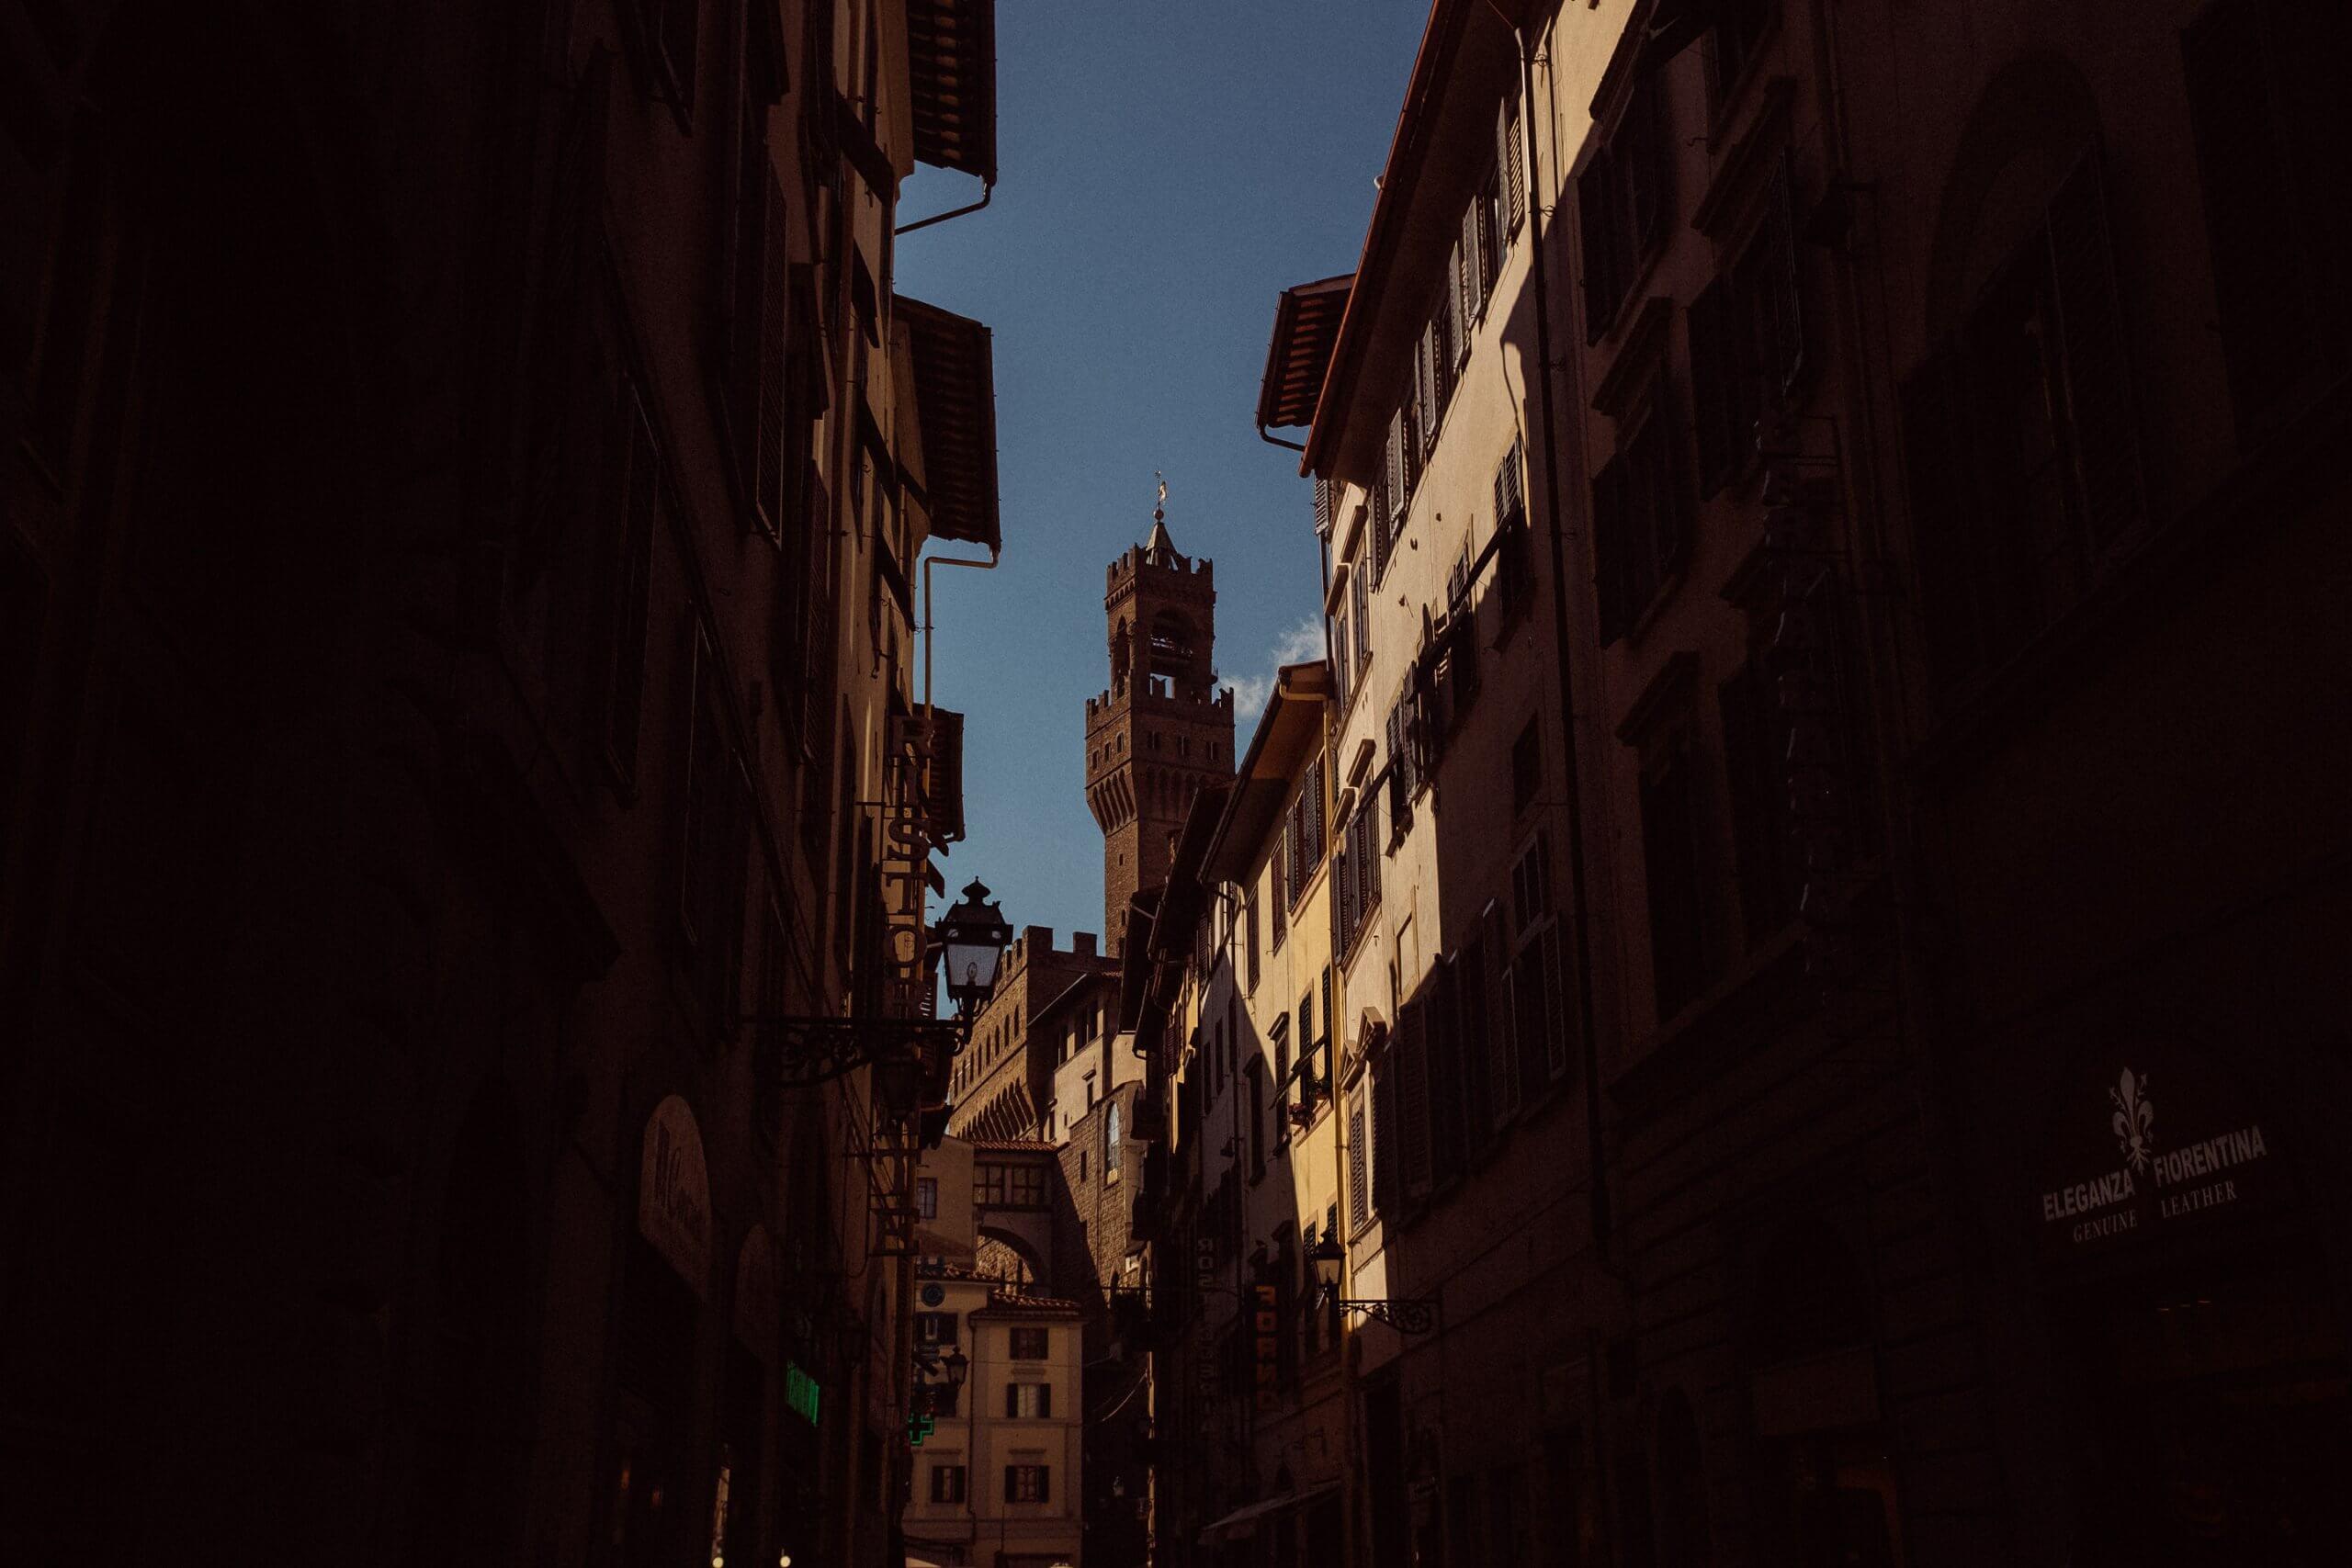 Travel-Florence-Photography-Johannes-Maur-3180